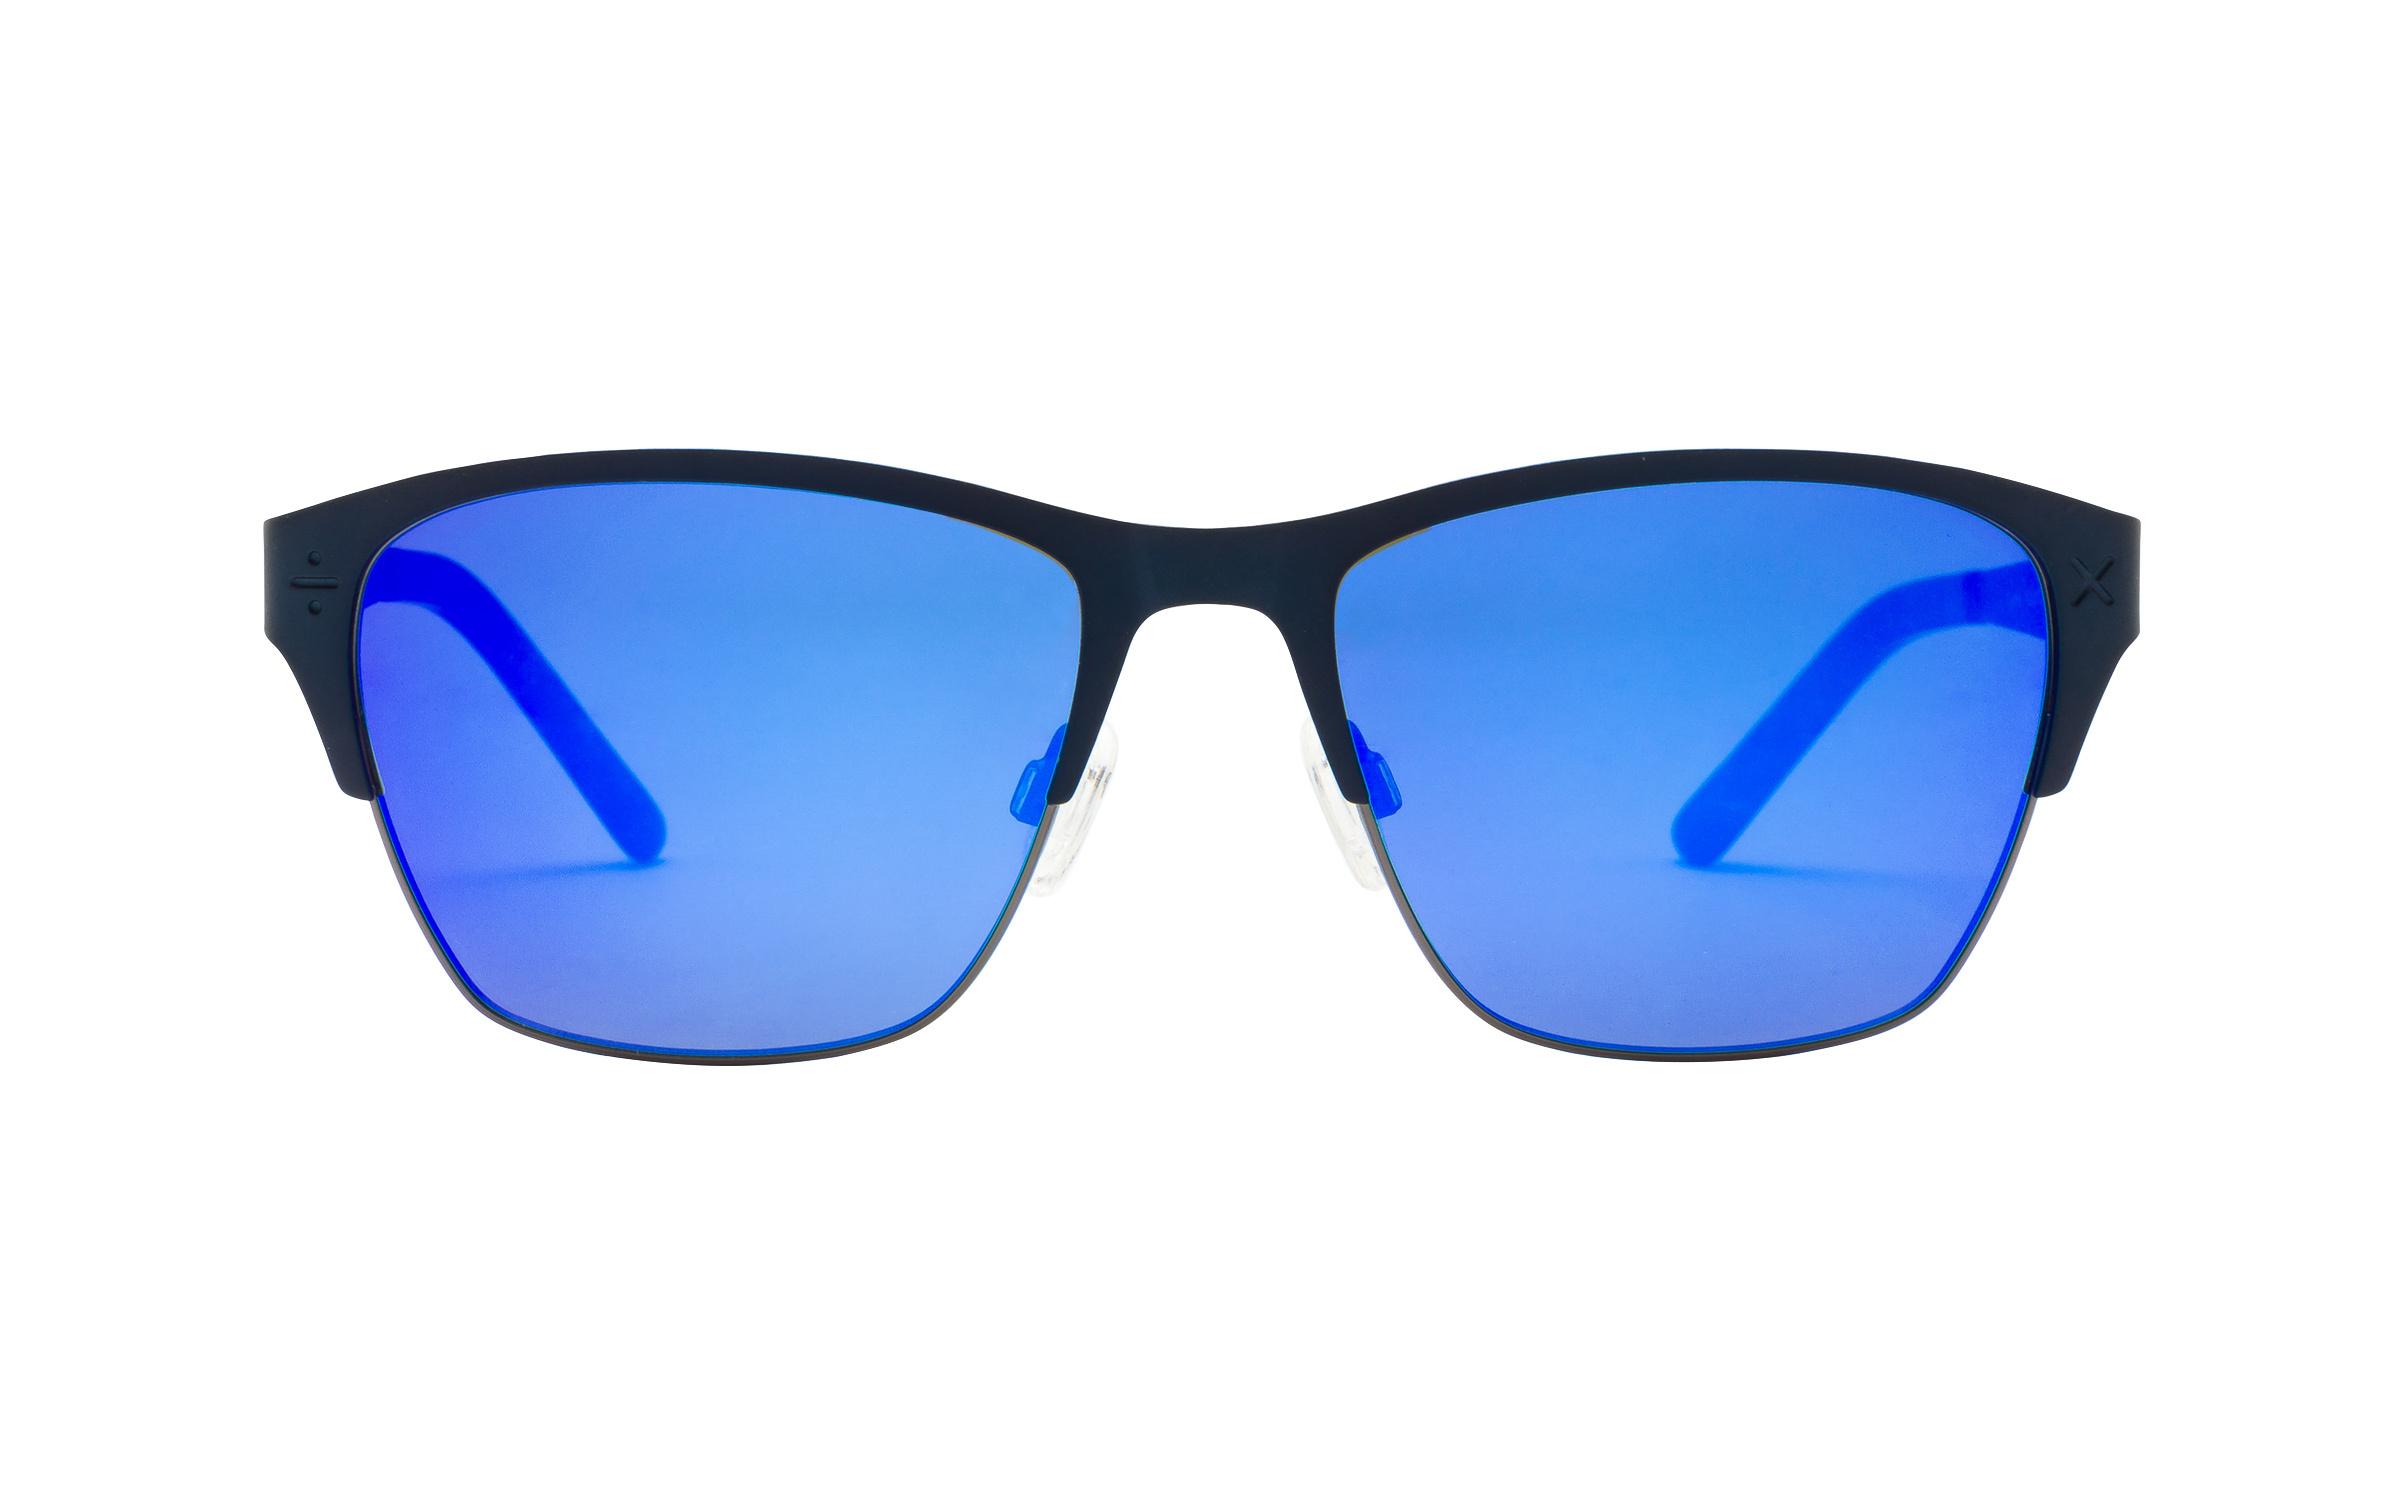 D-Frame Sunglasses Blue Derek Cardigan Online Coastal